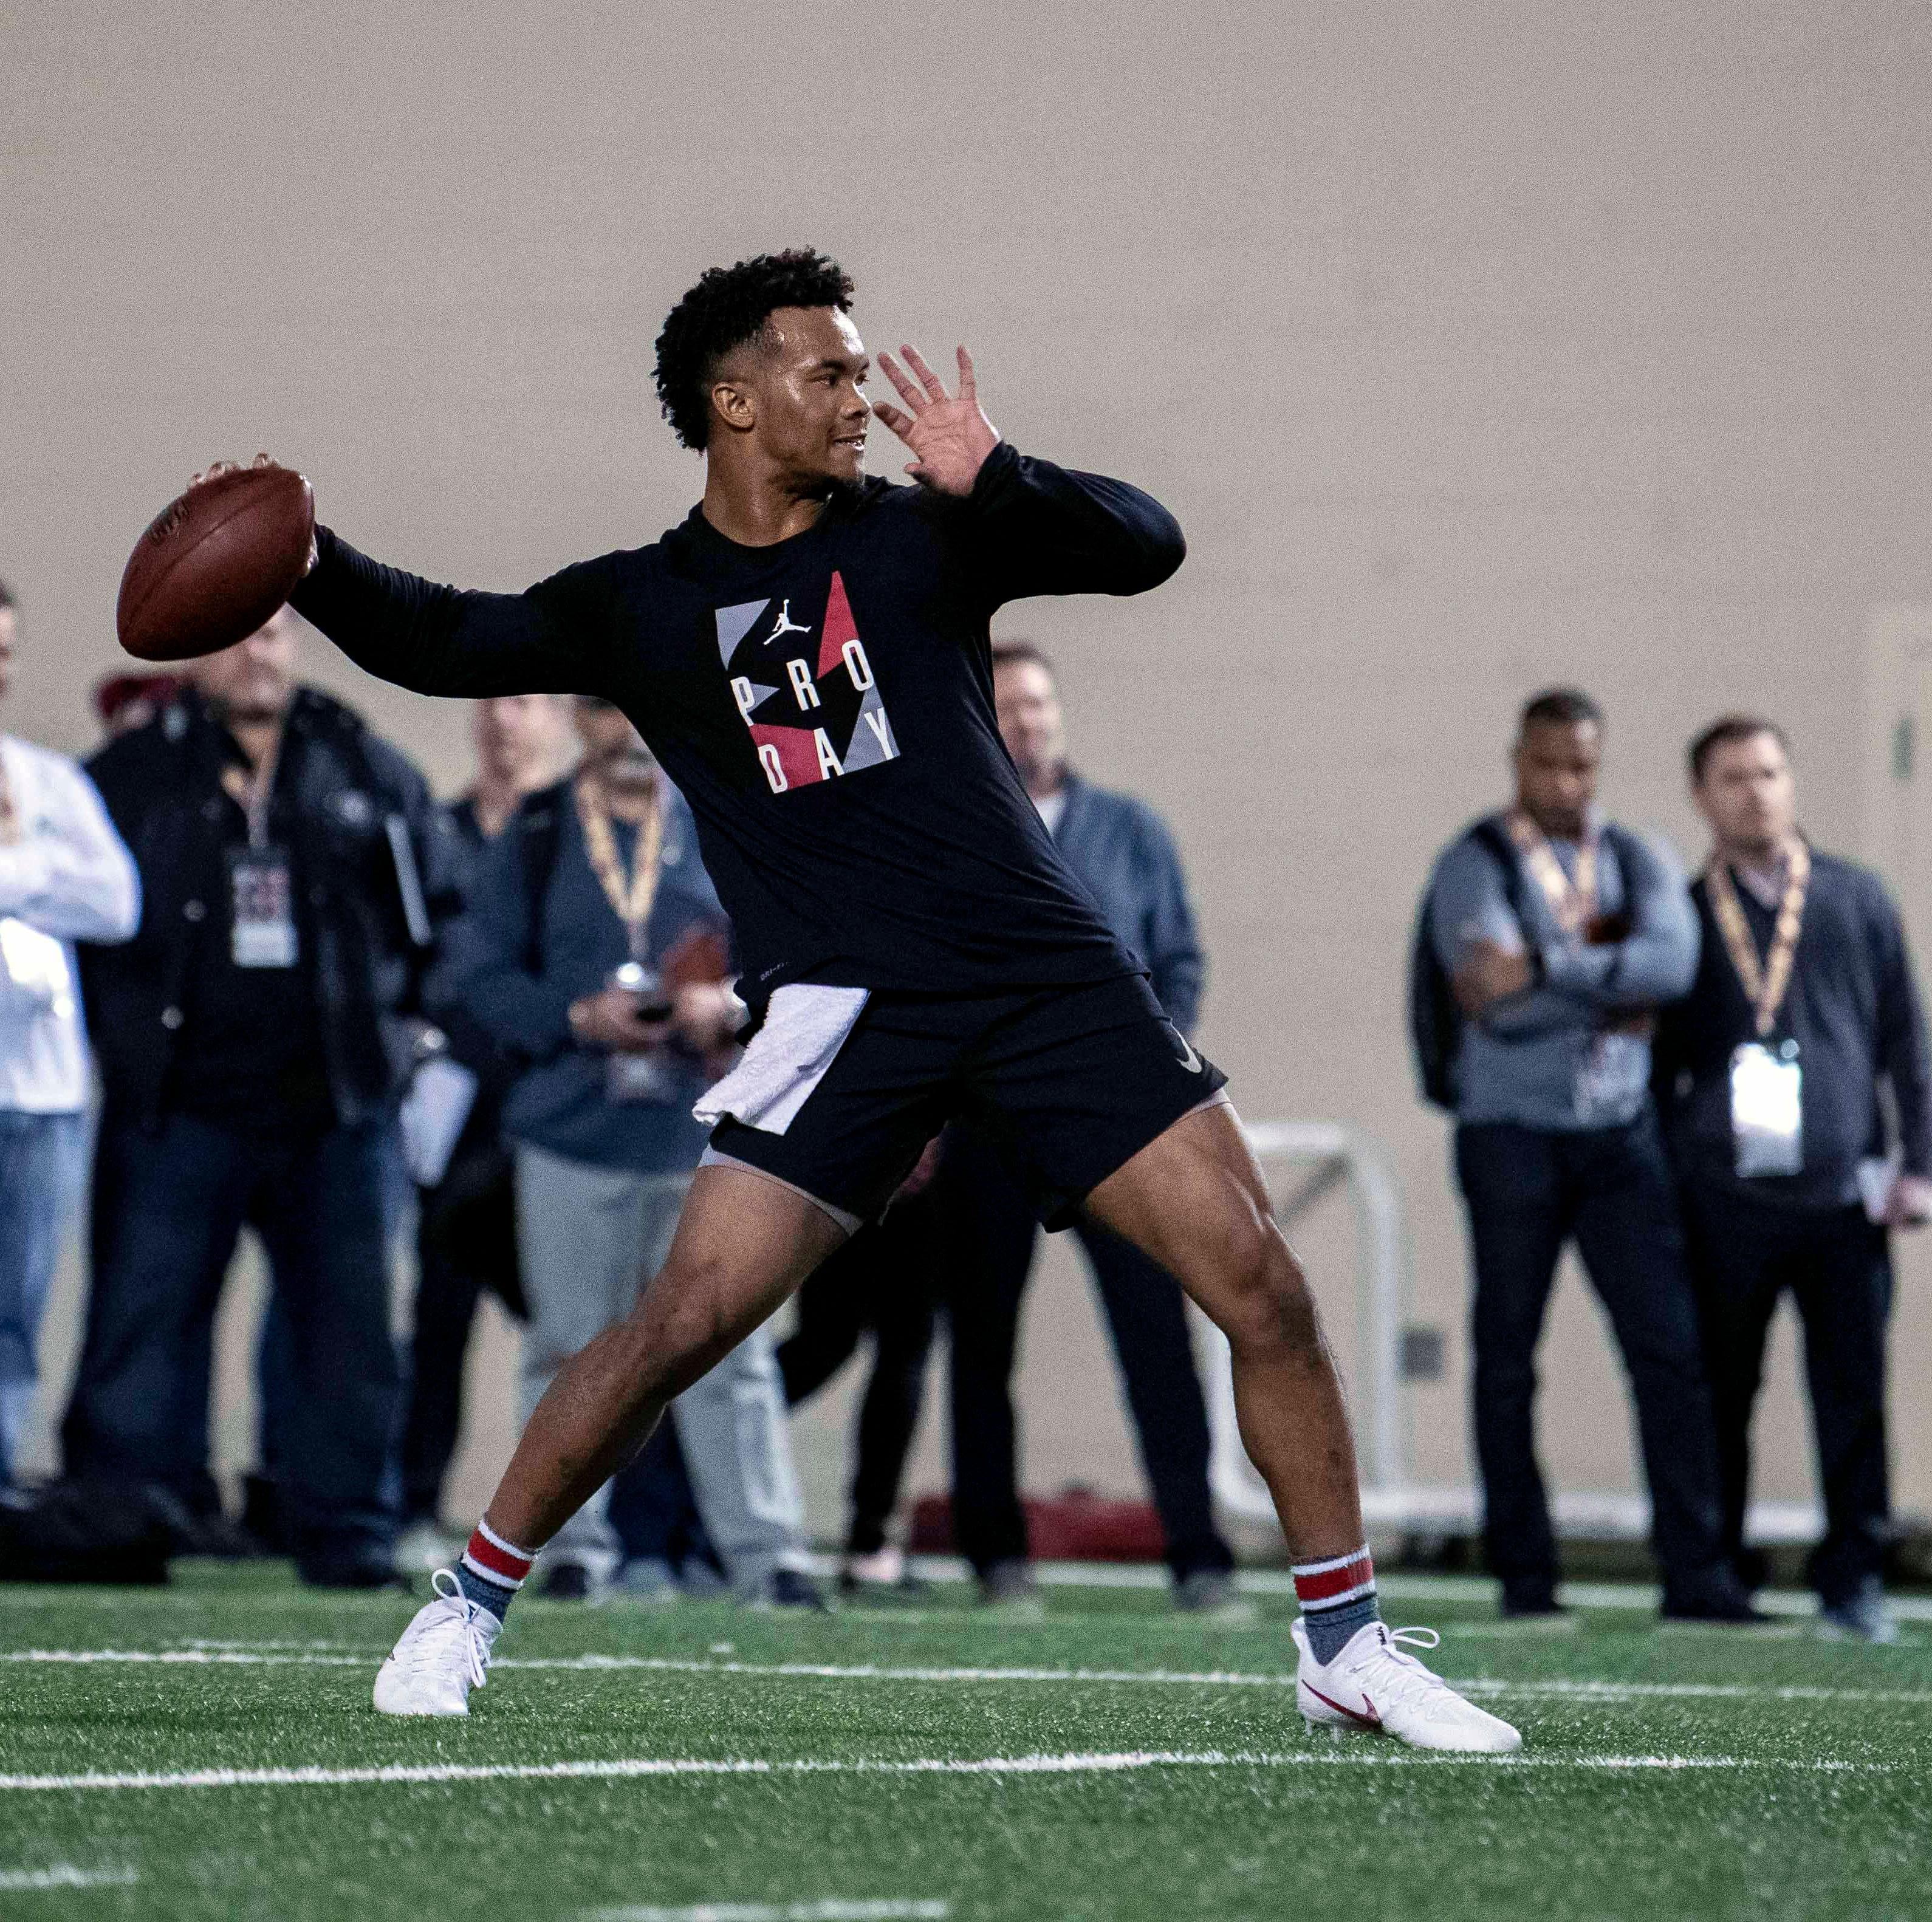 NFL mock draft: Kyler Murray or trade for Arizona Cardinals with No. 1 NFL draft pick